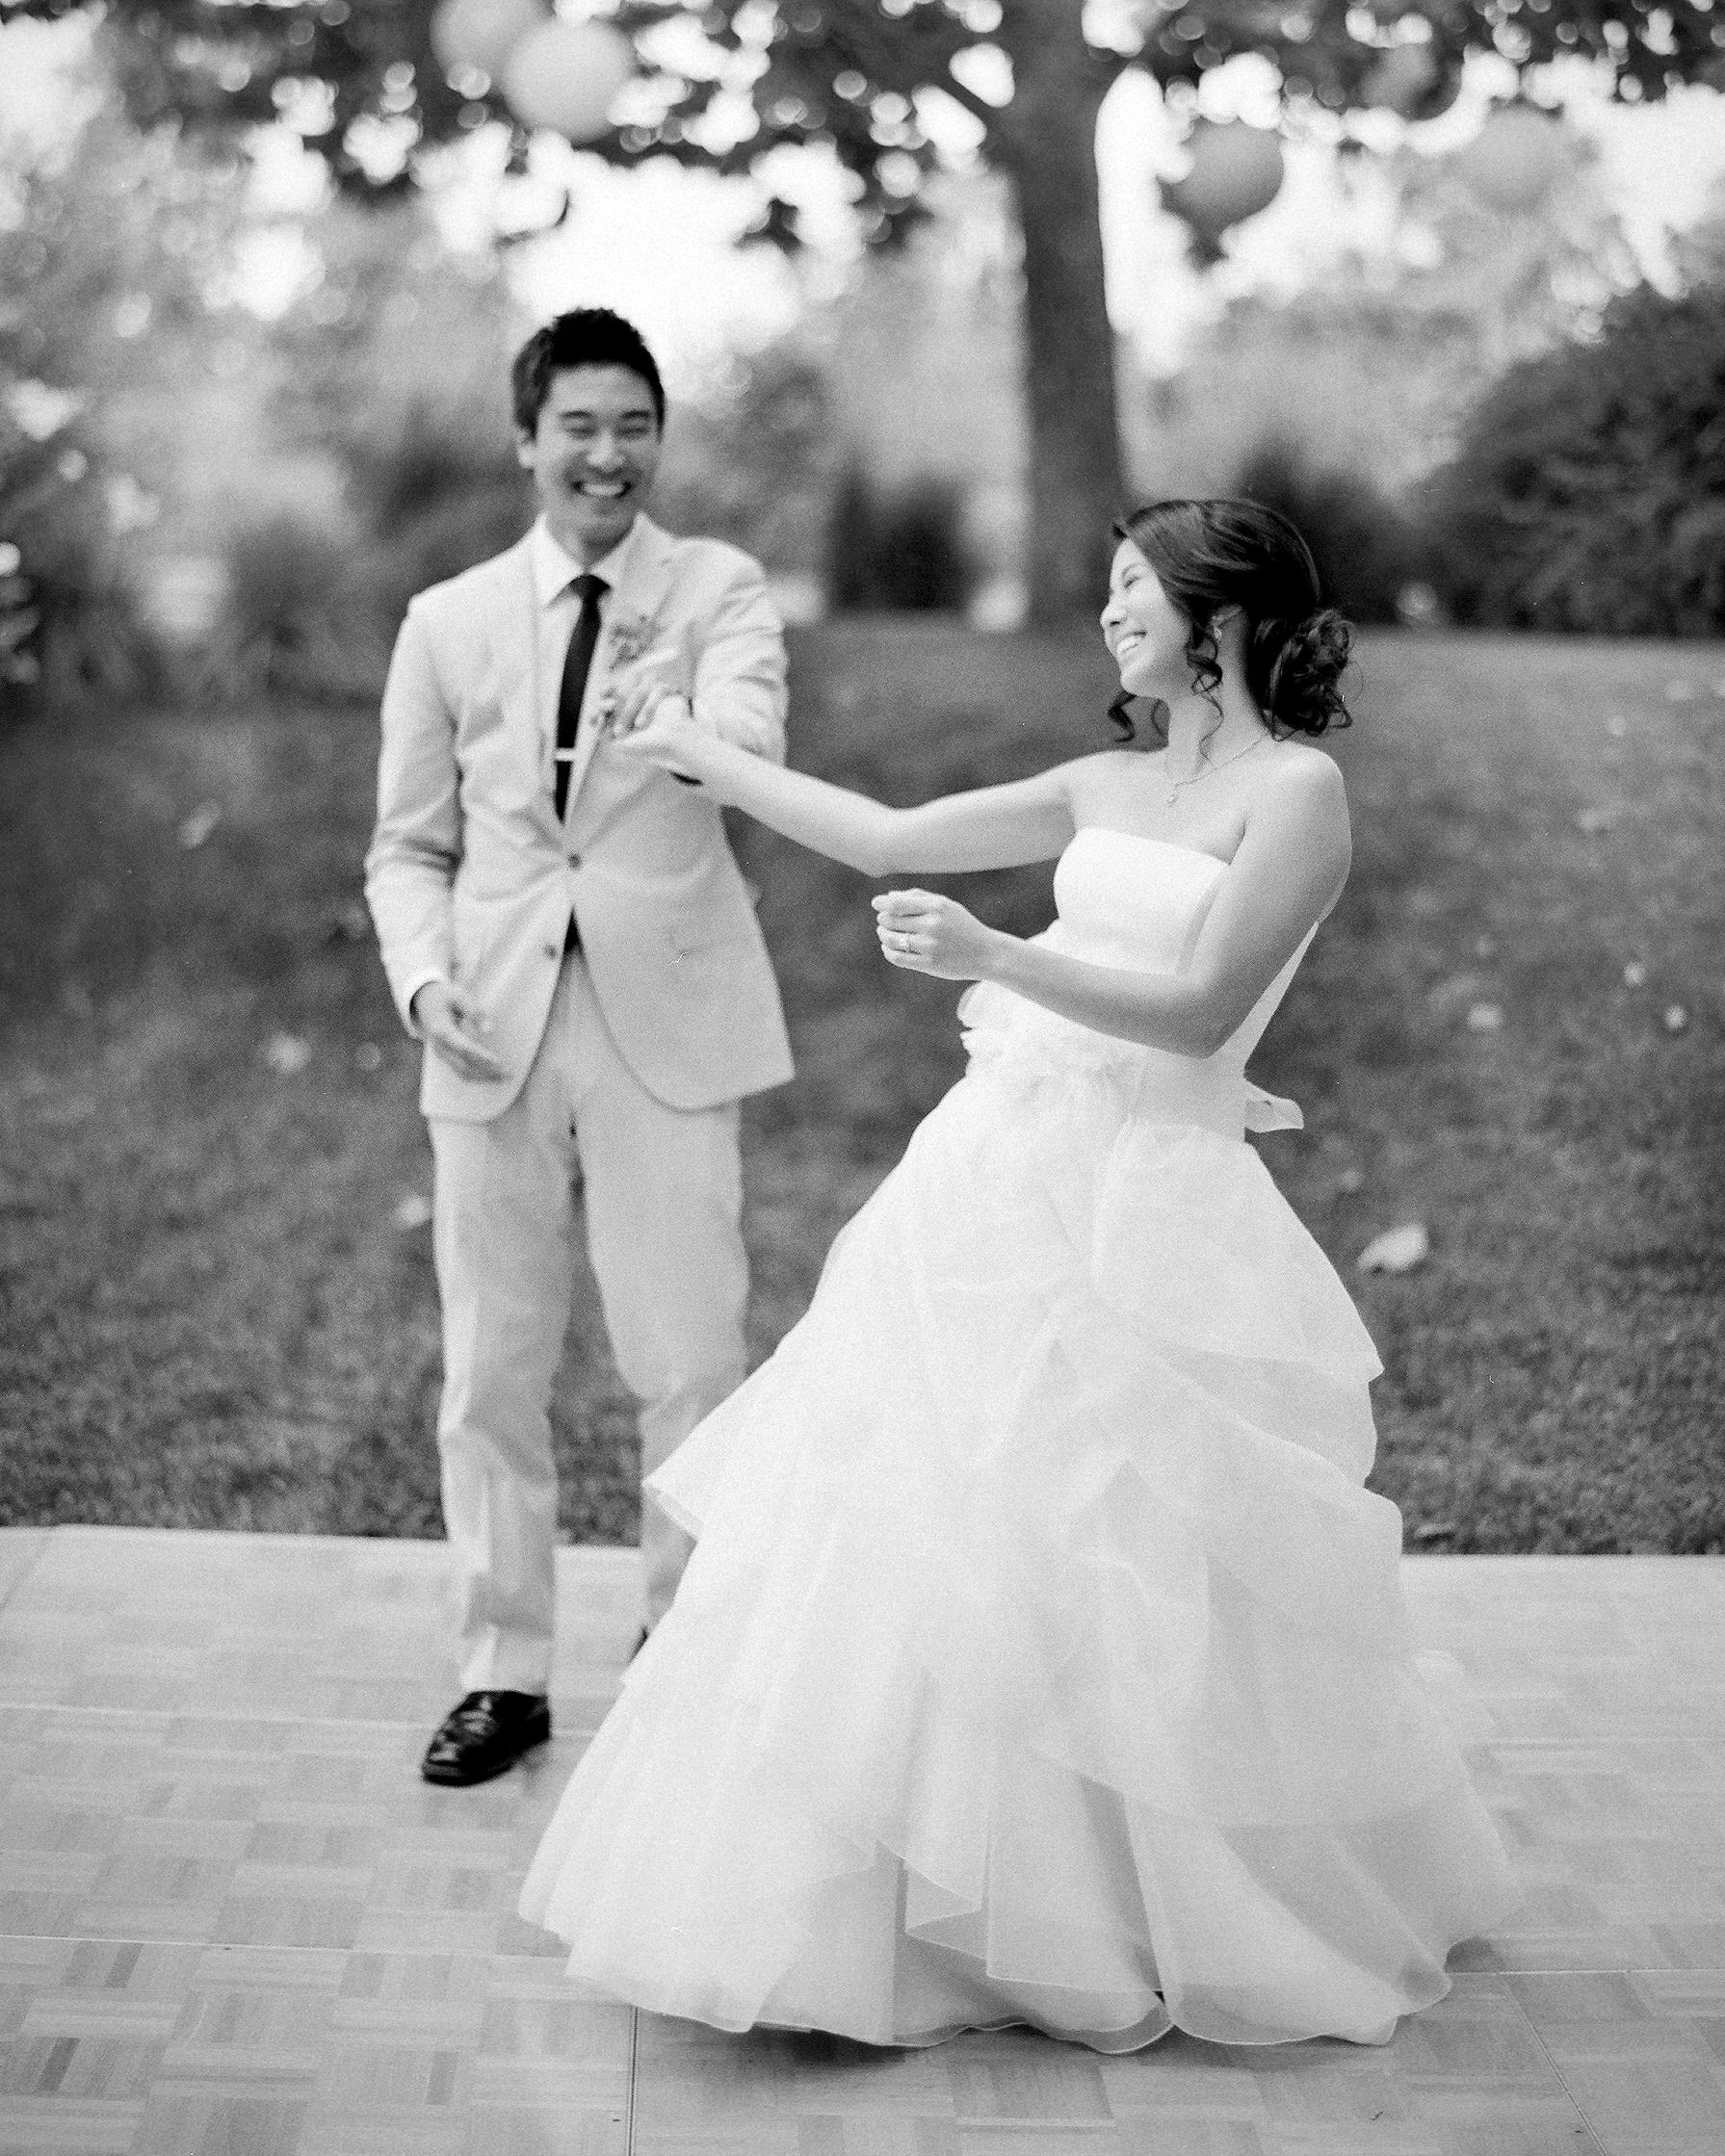 real-weddings-zoe-john-35510002.jpg